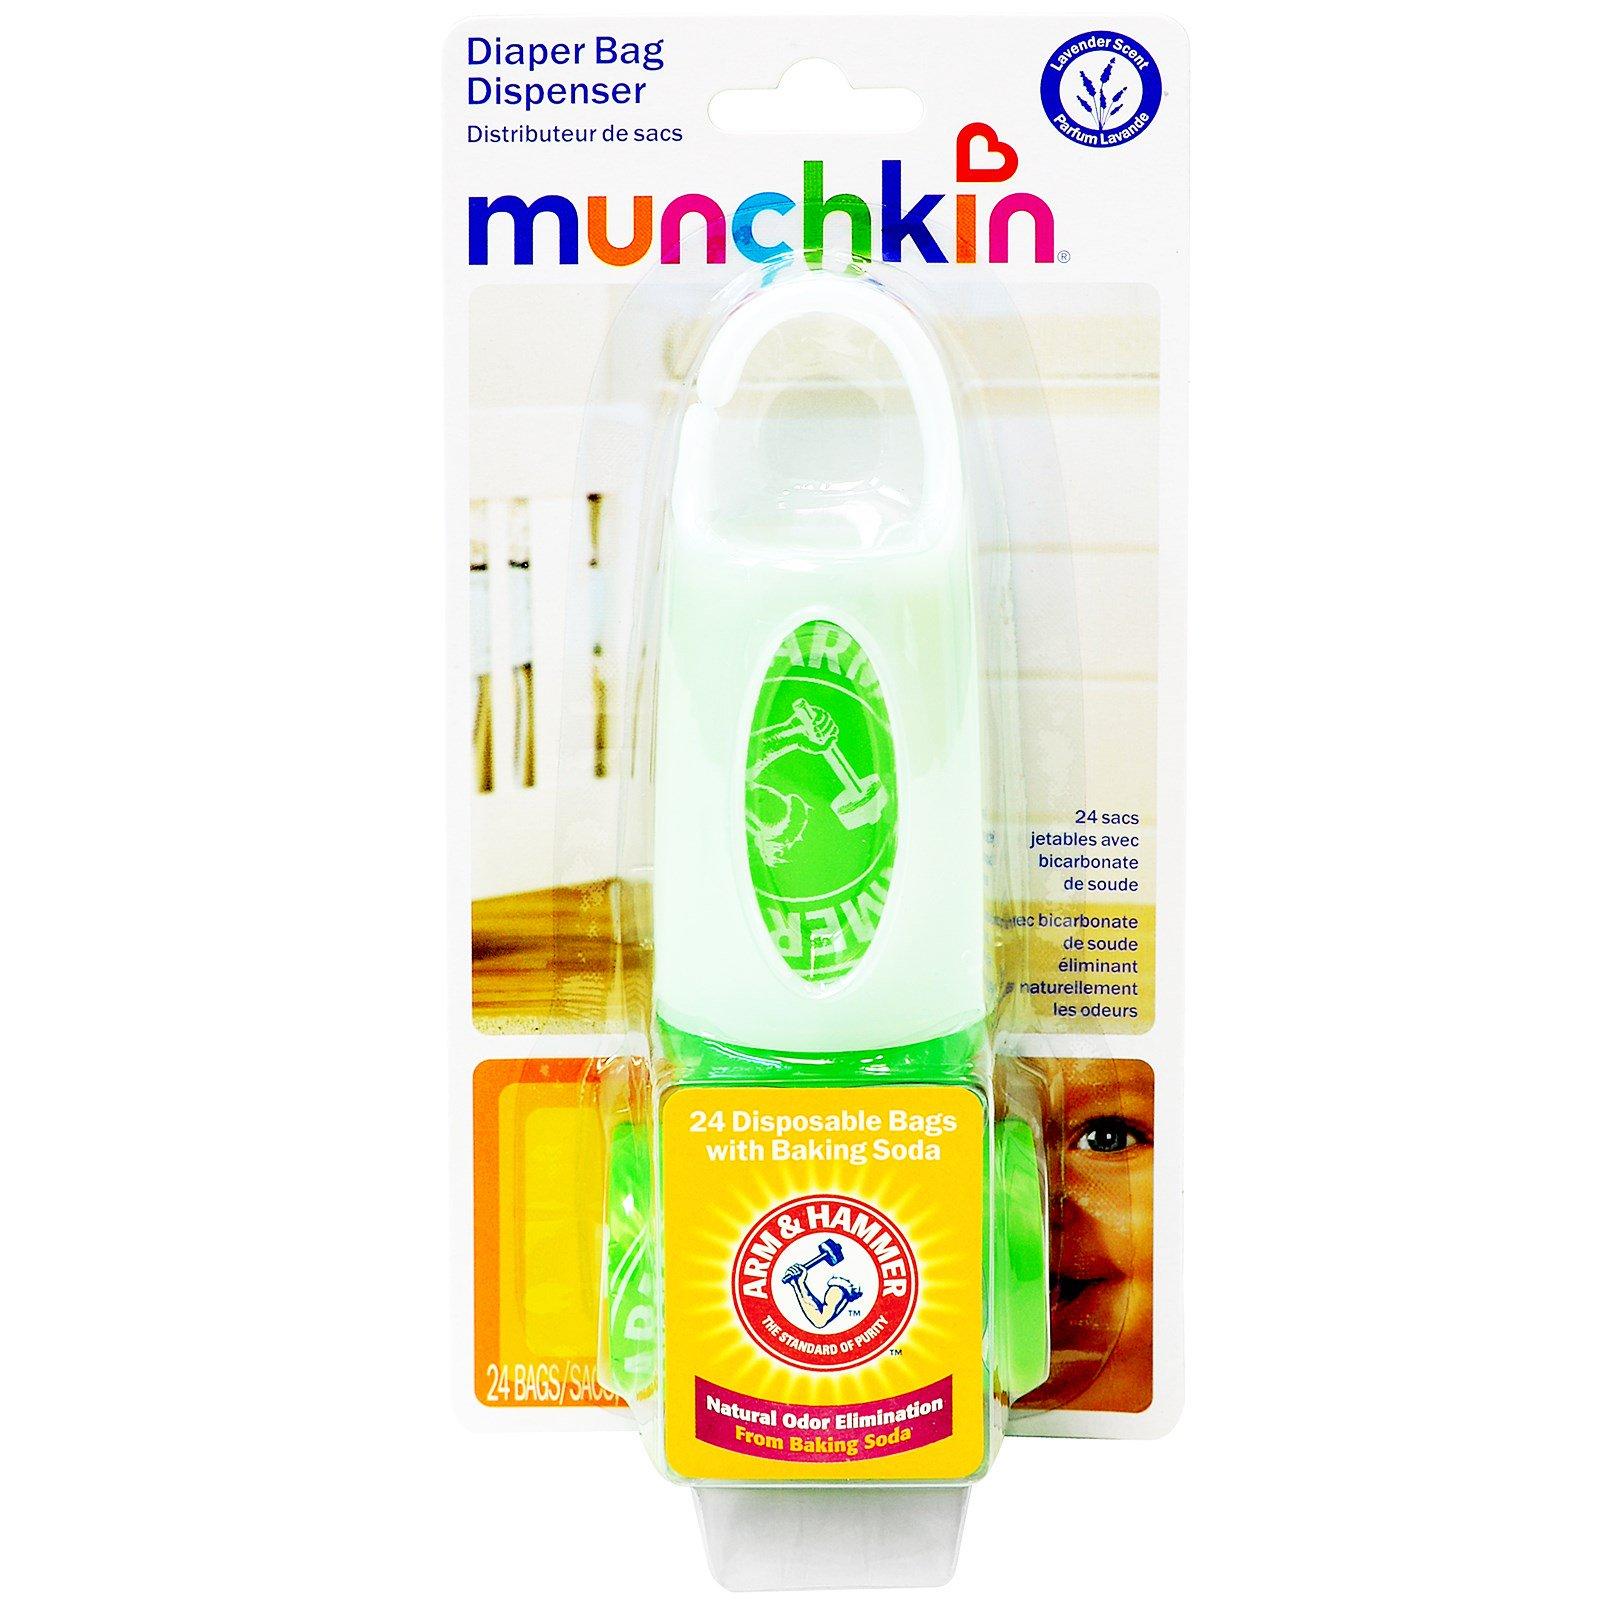 Munchkin, Dispensador de Sacos para Fralda Suja,